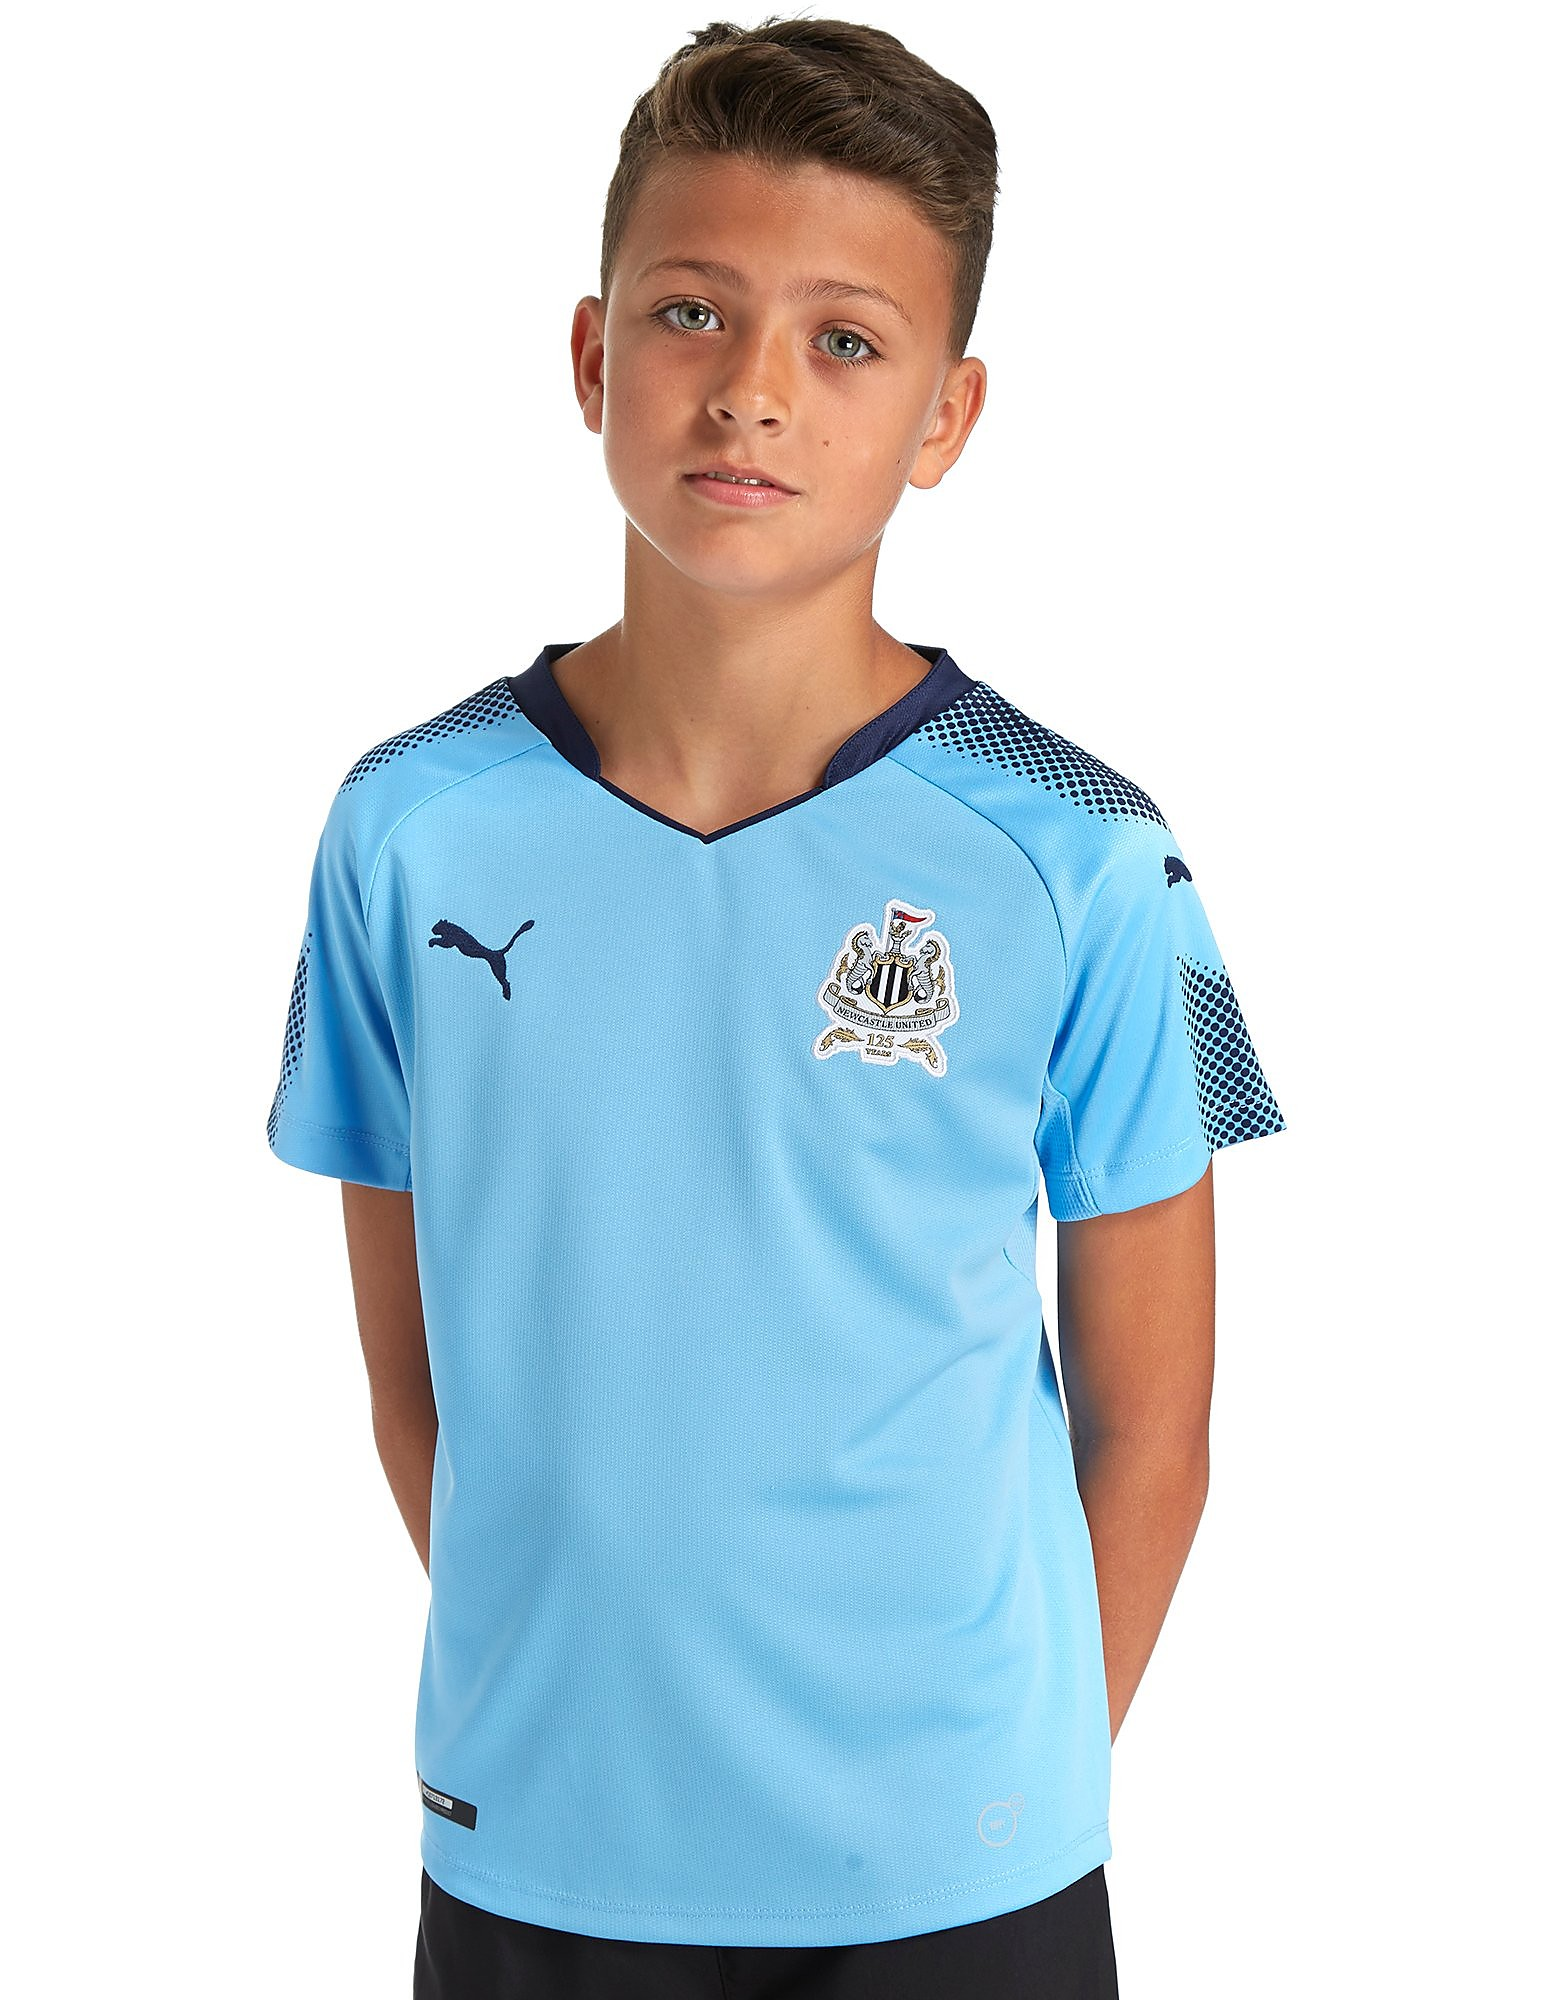 PUMA Newcastle United 2017/18 Away Shirt Junior